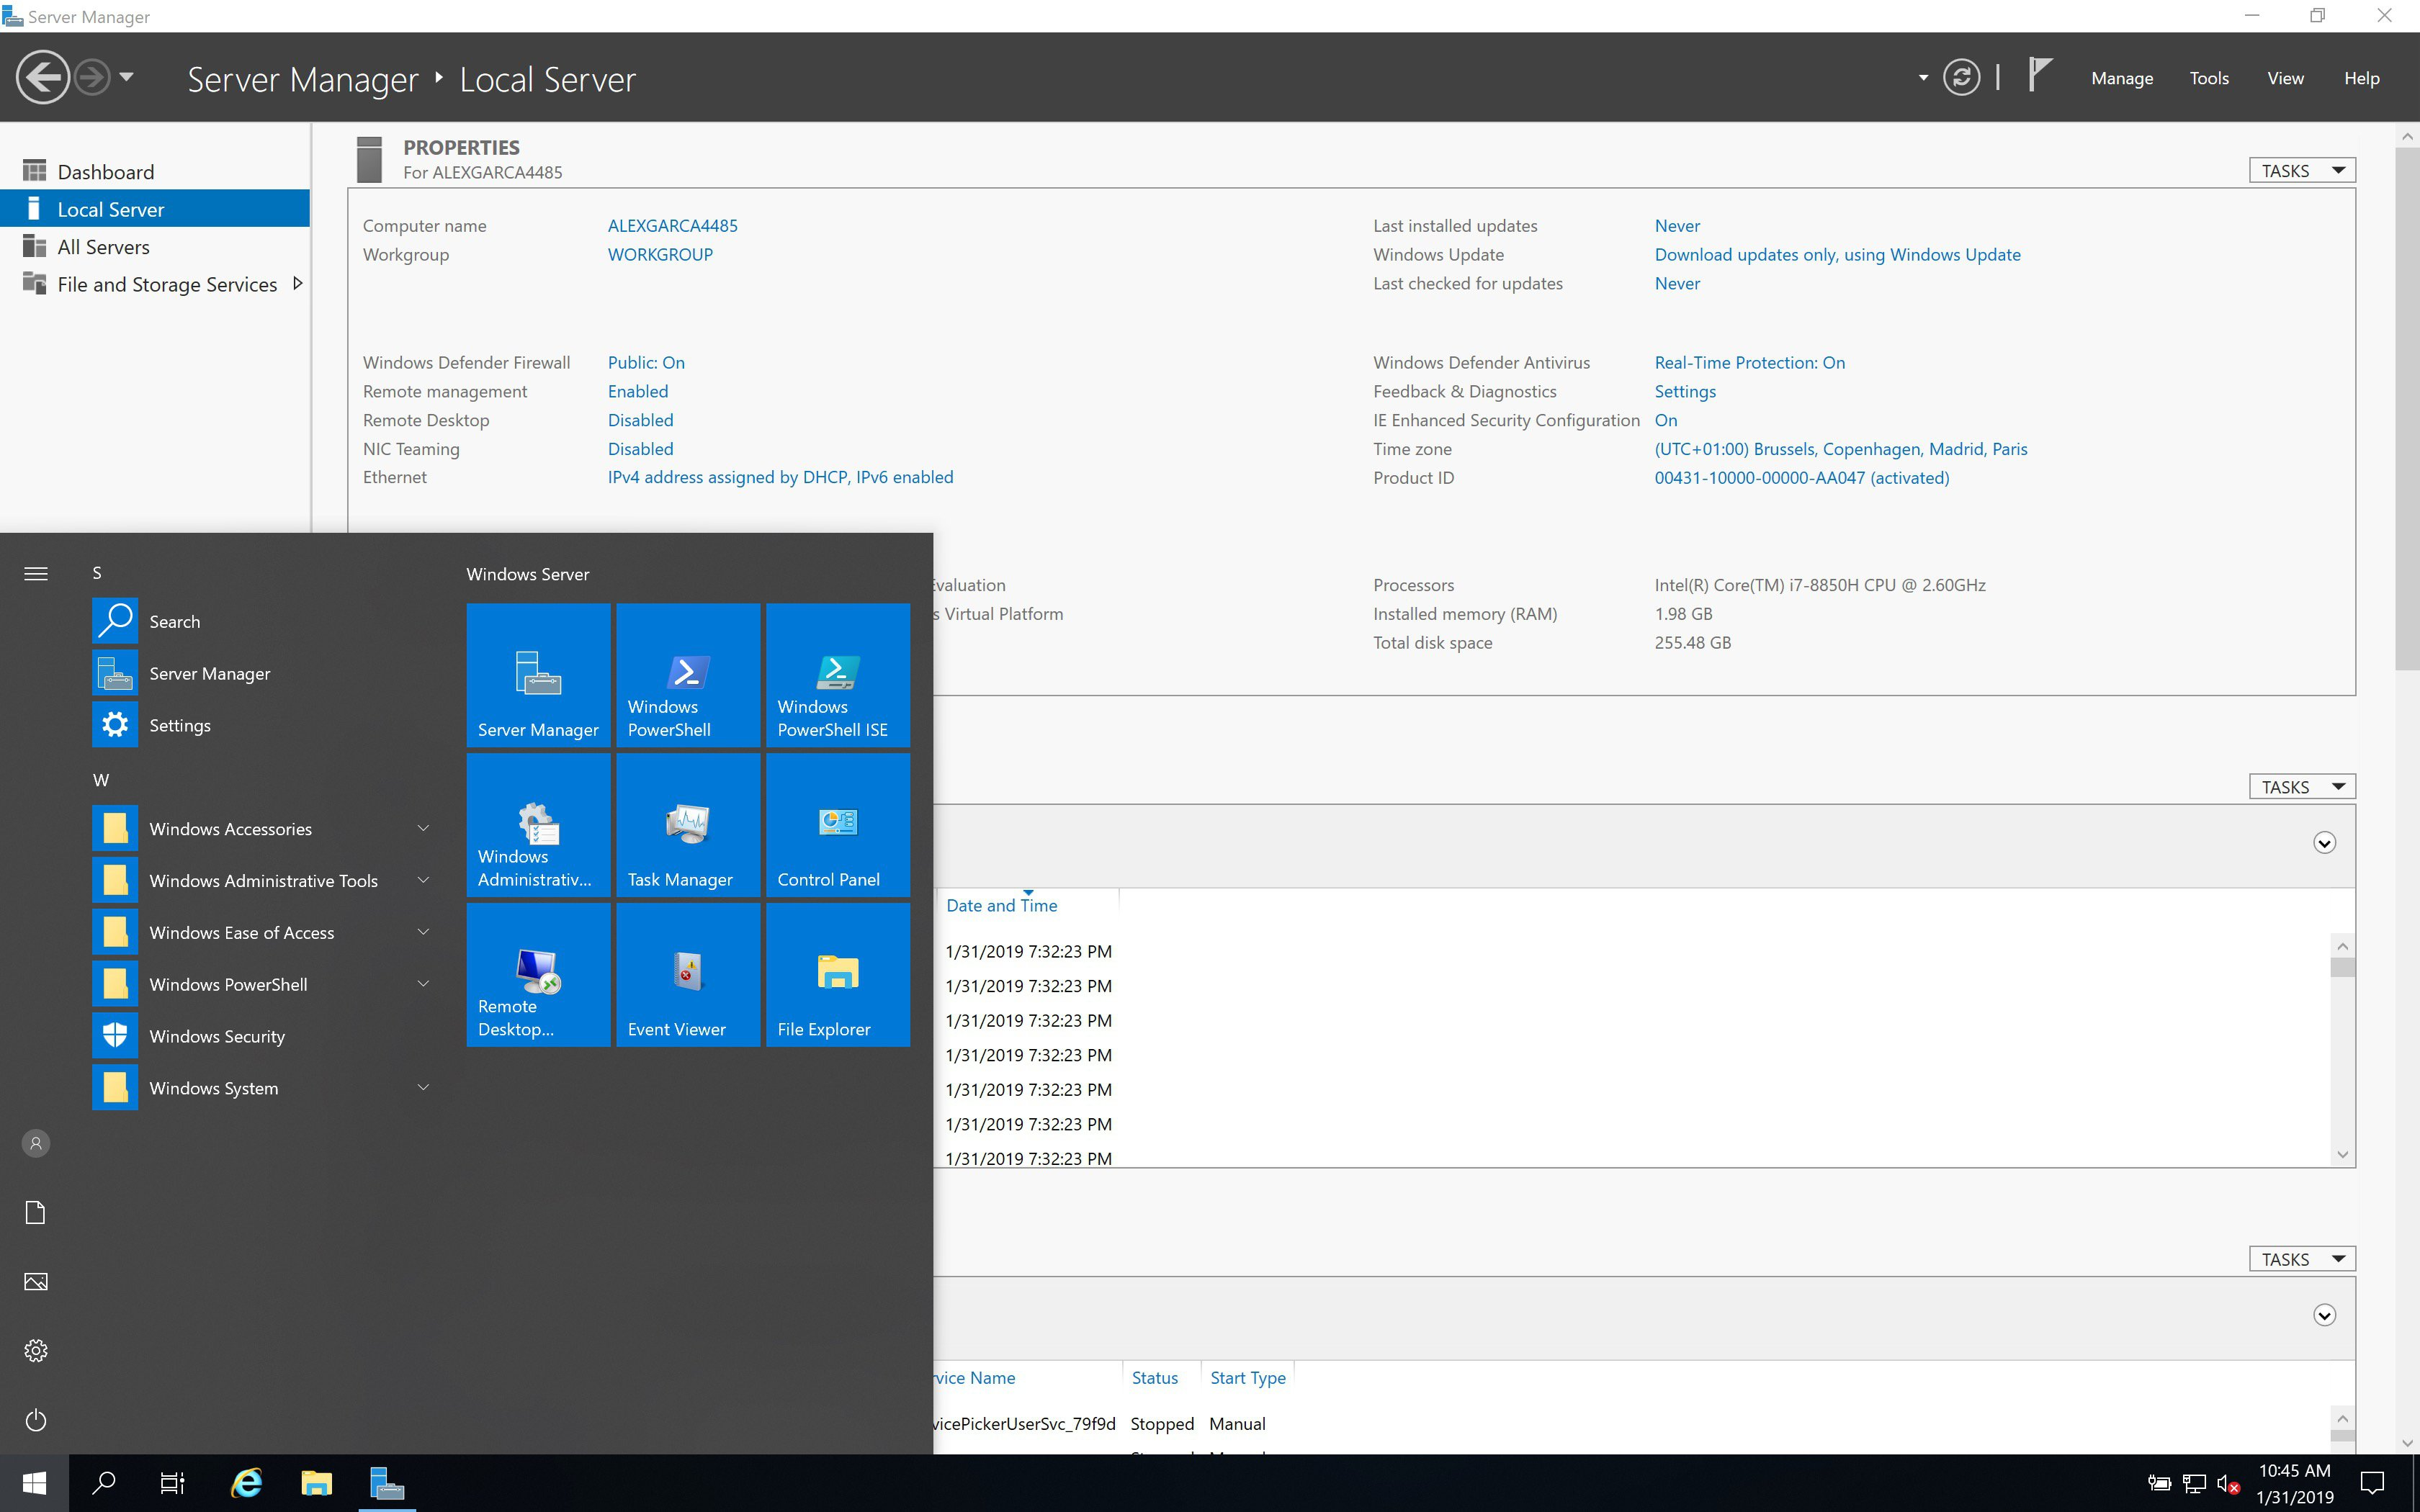 Microsoft Windows Server 2019 v1909 January 2020 Build 18363.592 Download